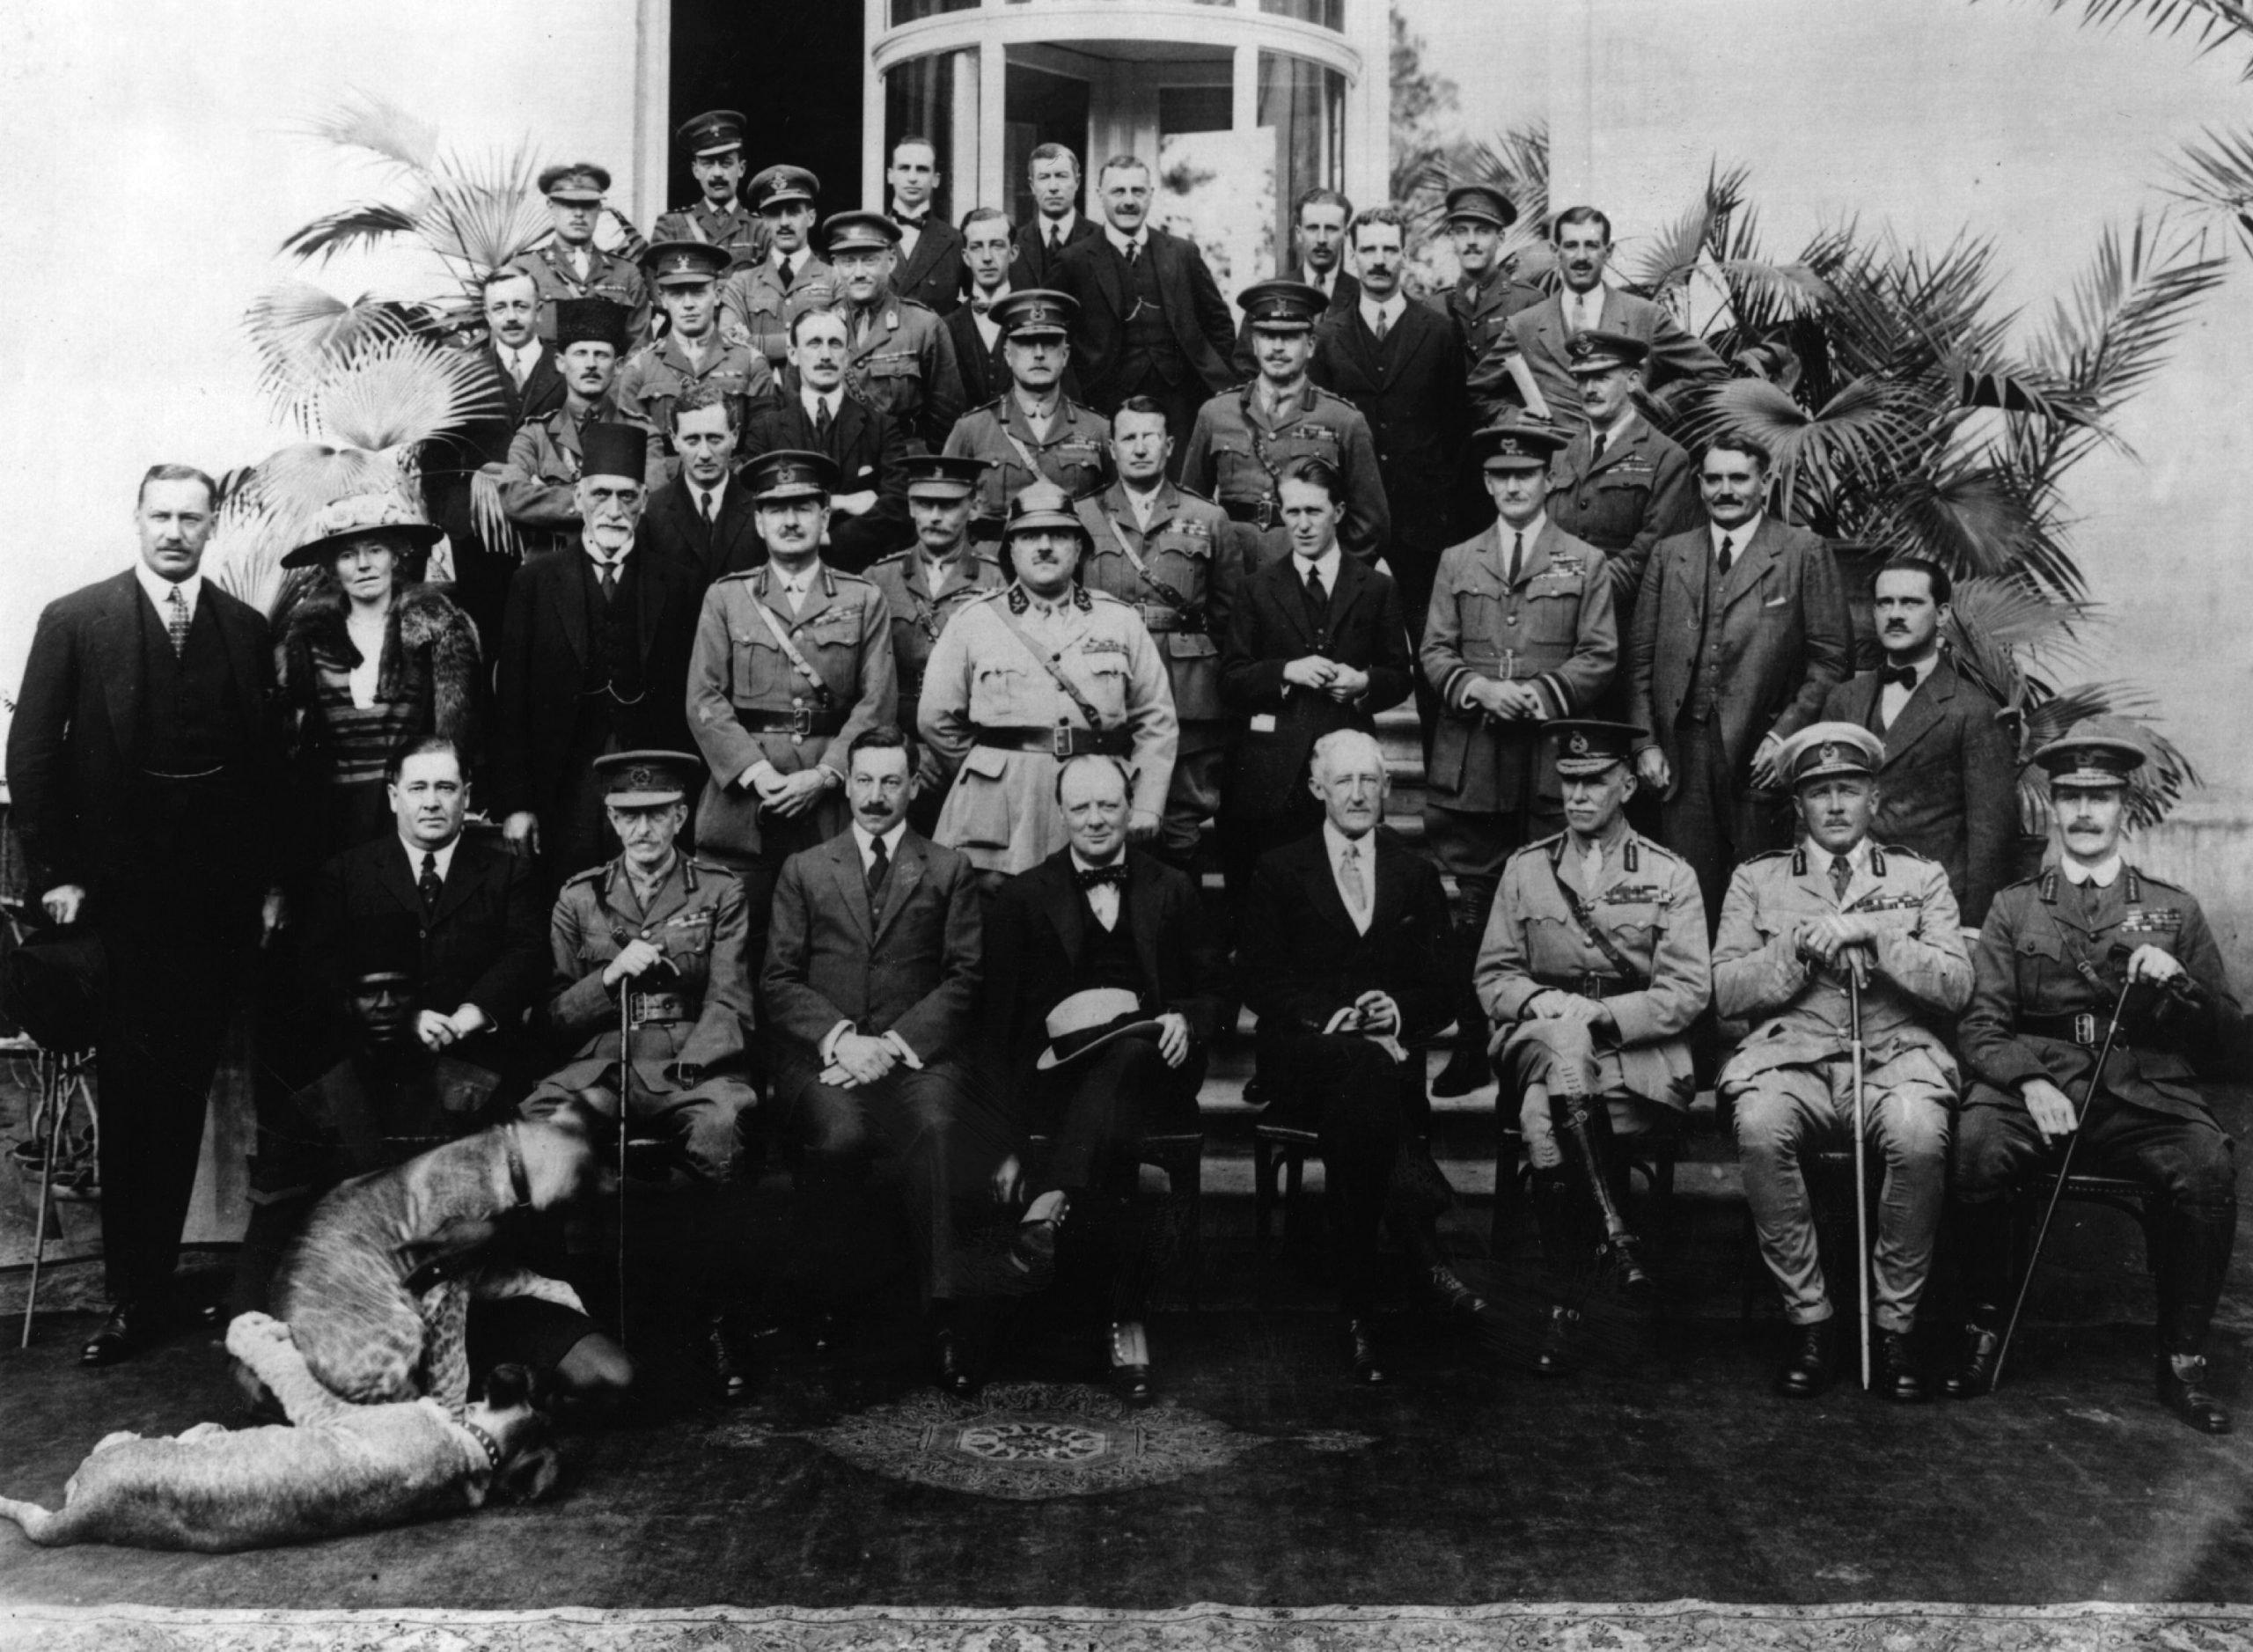 Members of the Mesopotamia Commission